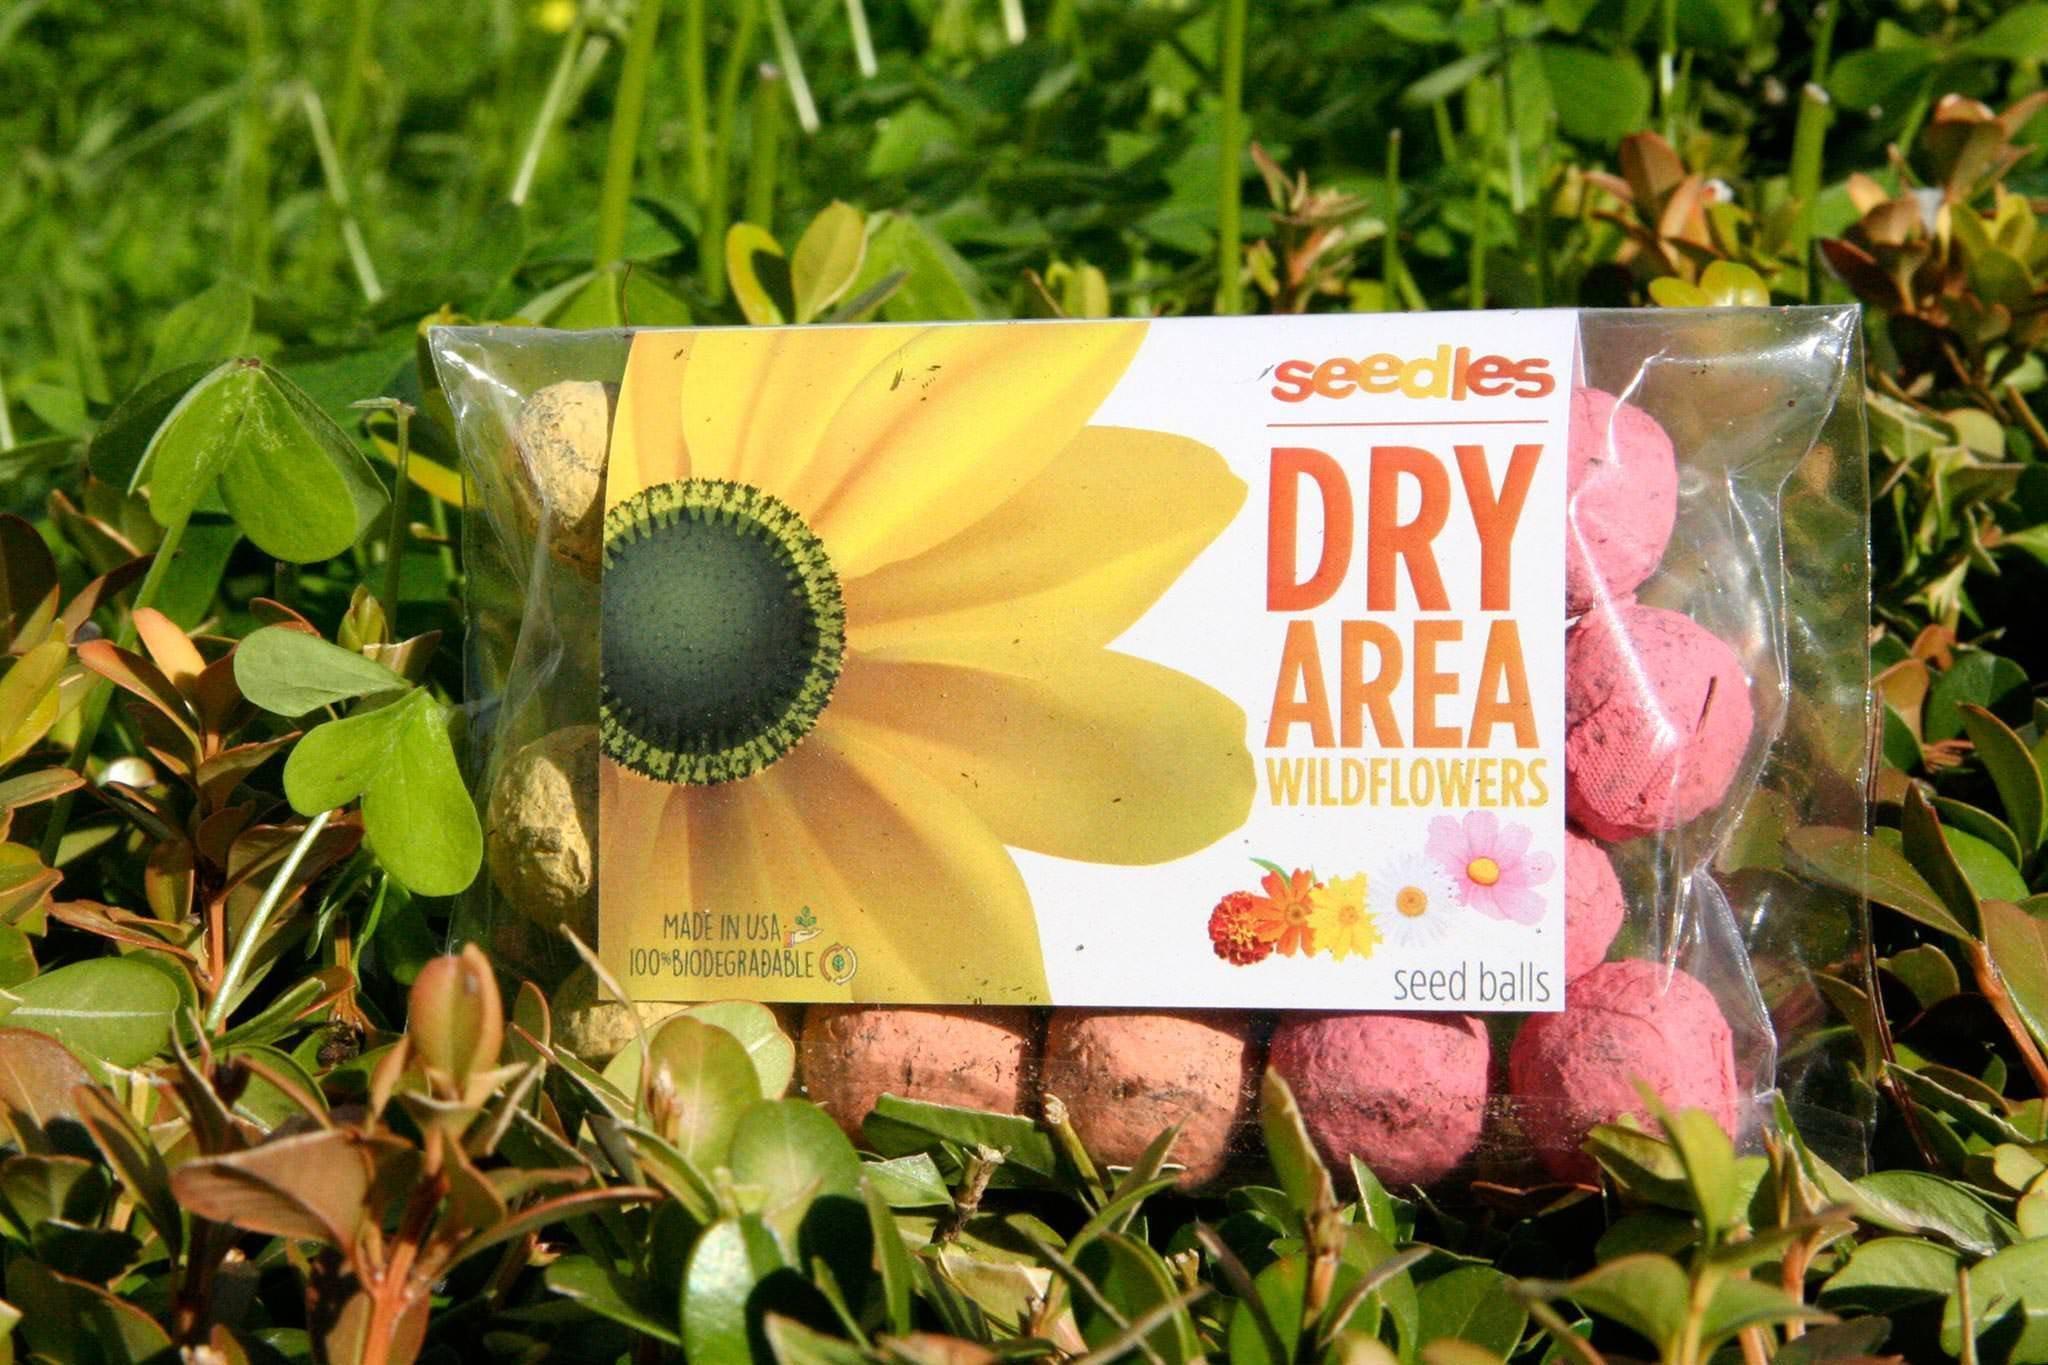 Seedles Dry Area Easily Grow Wildflowers